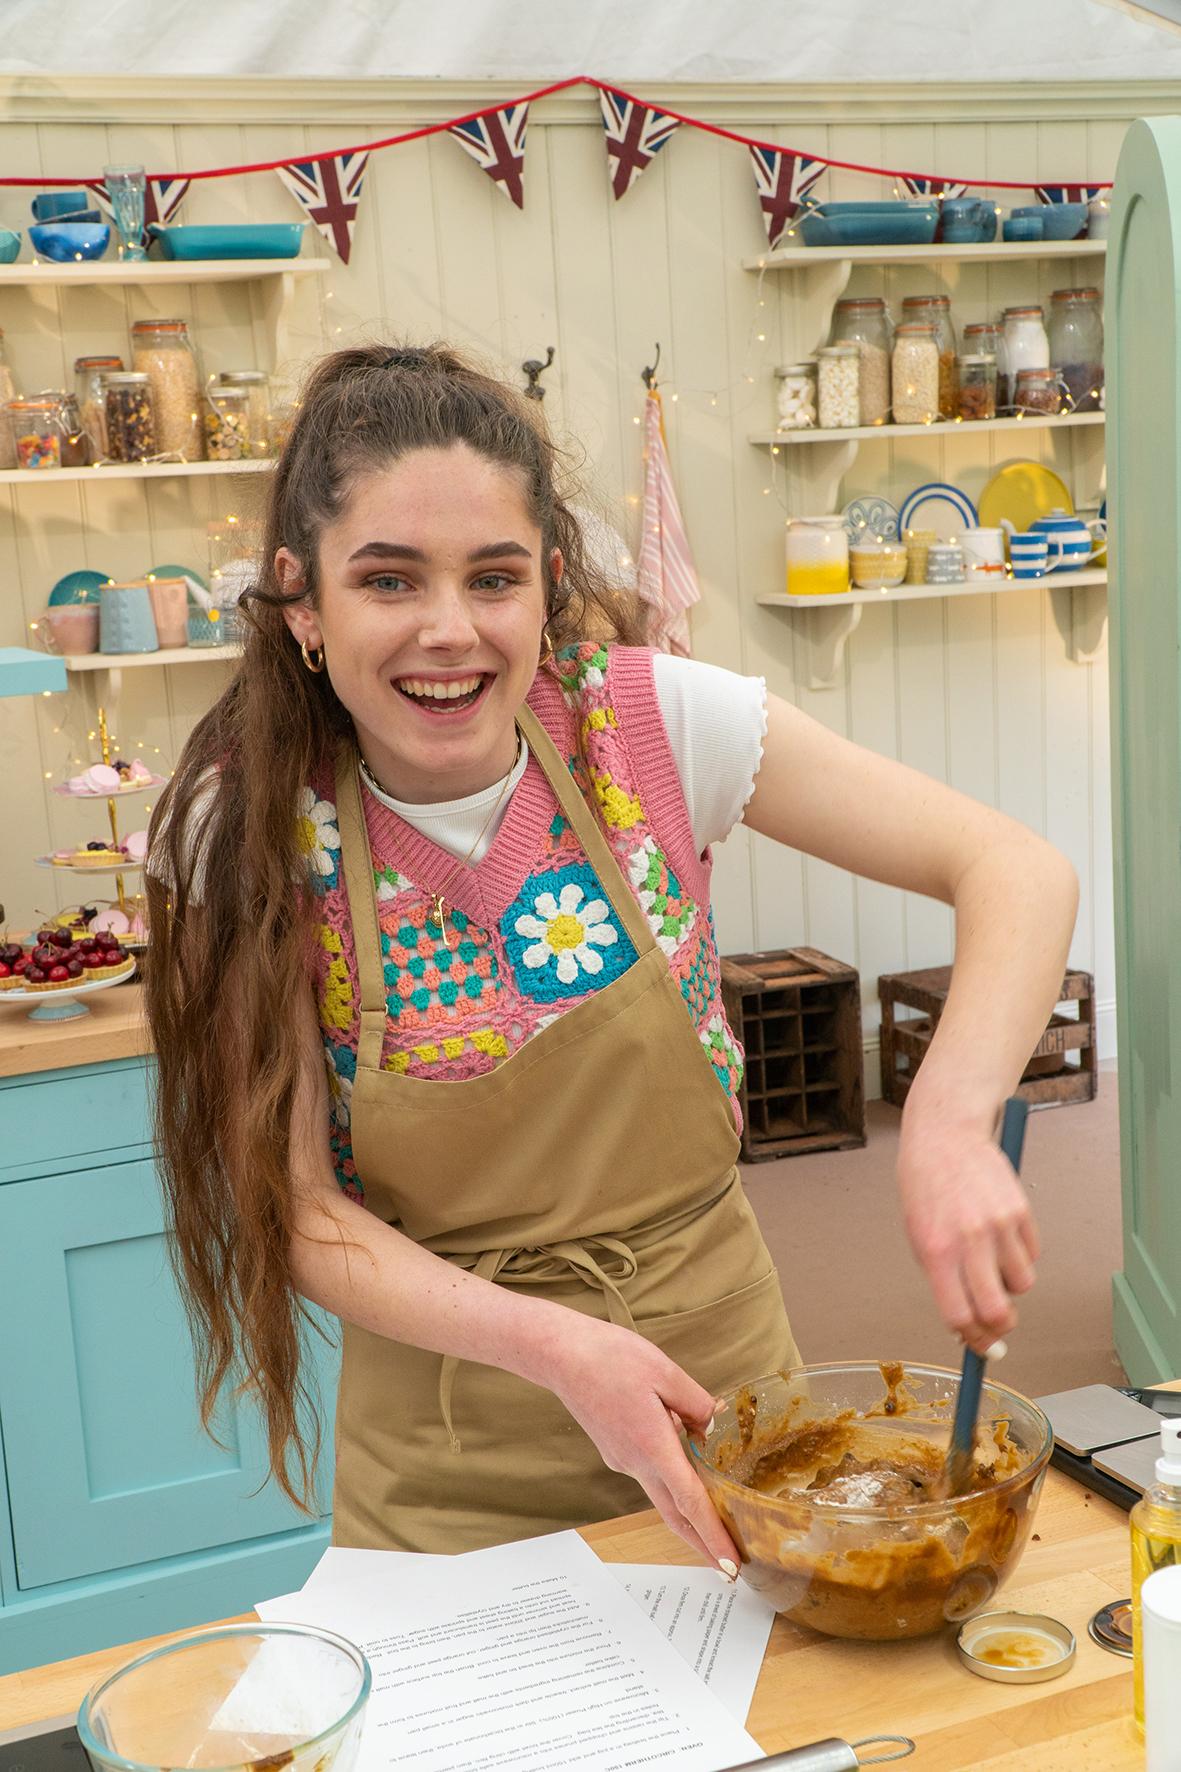 Freya The Great British Bake Off